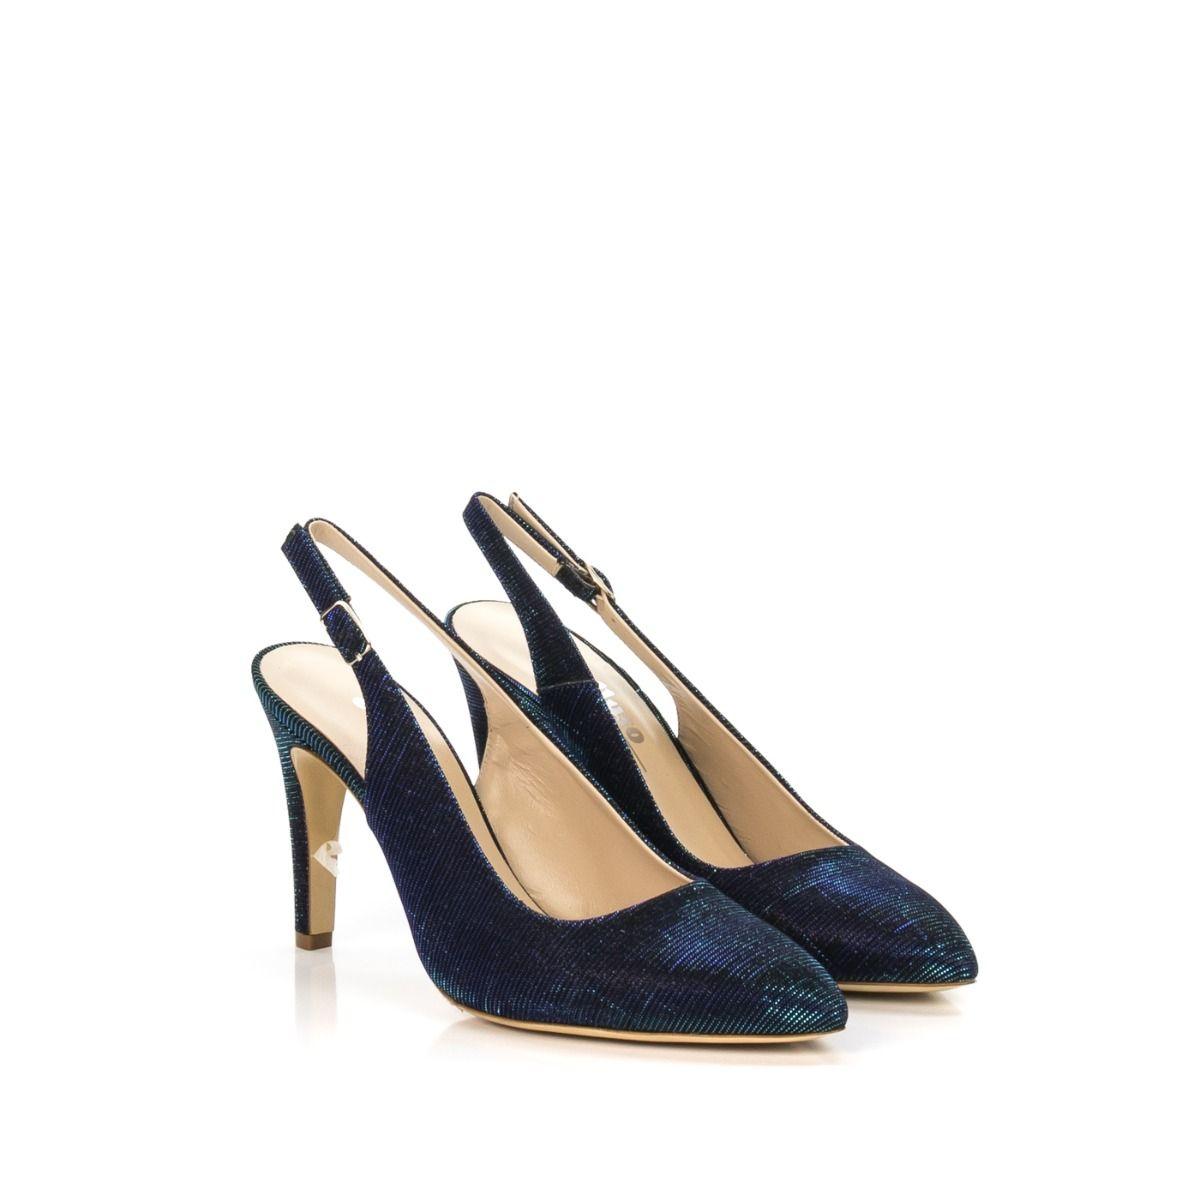 enorme sconto enorme inventario vende Chanel donna MELLUSO D077E GALASSIA in tessuto lamé blu ...